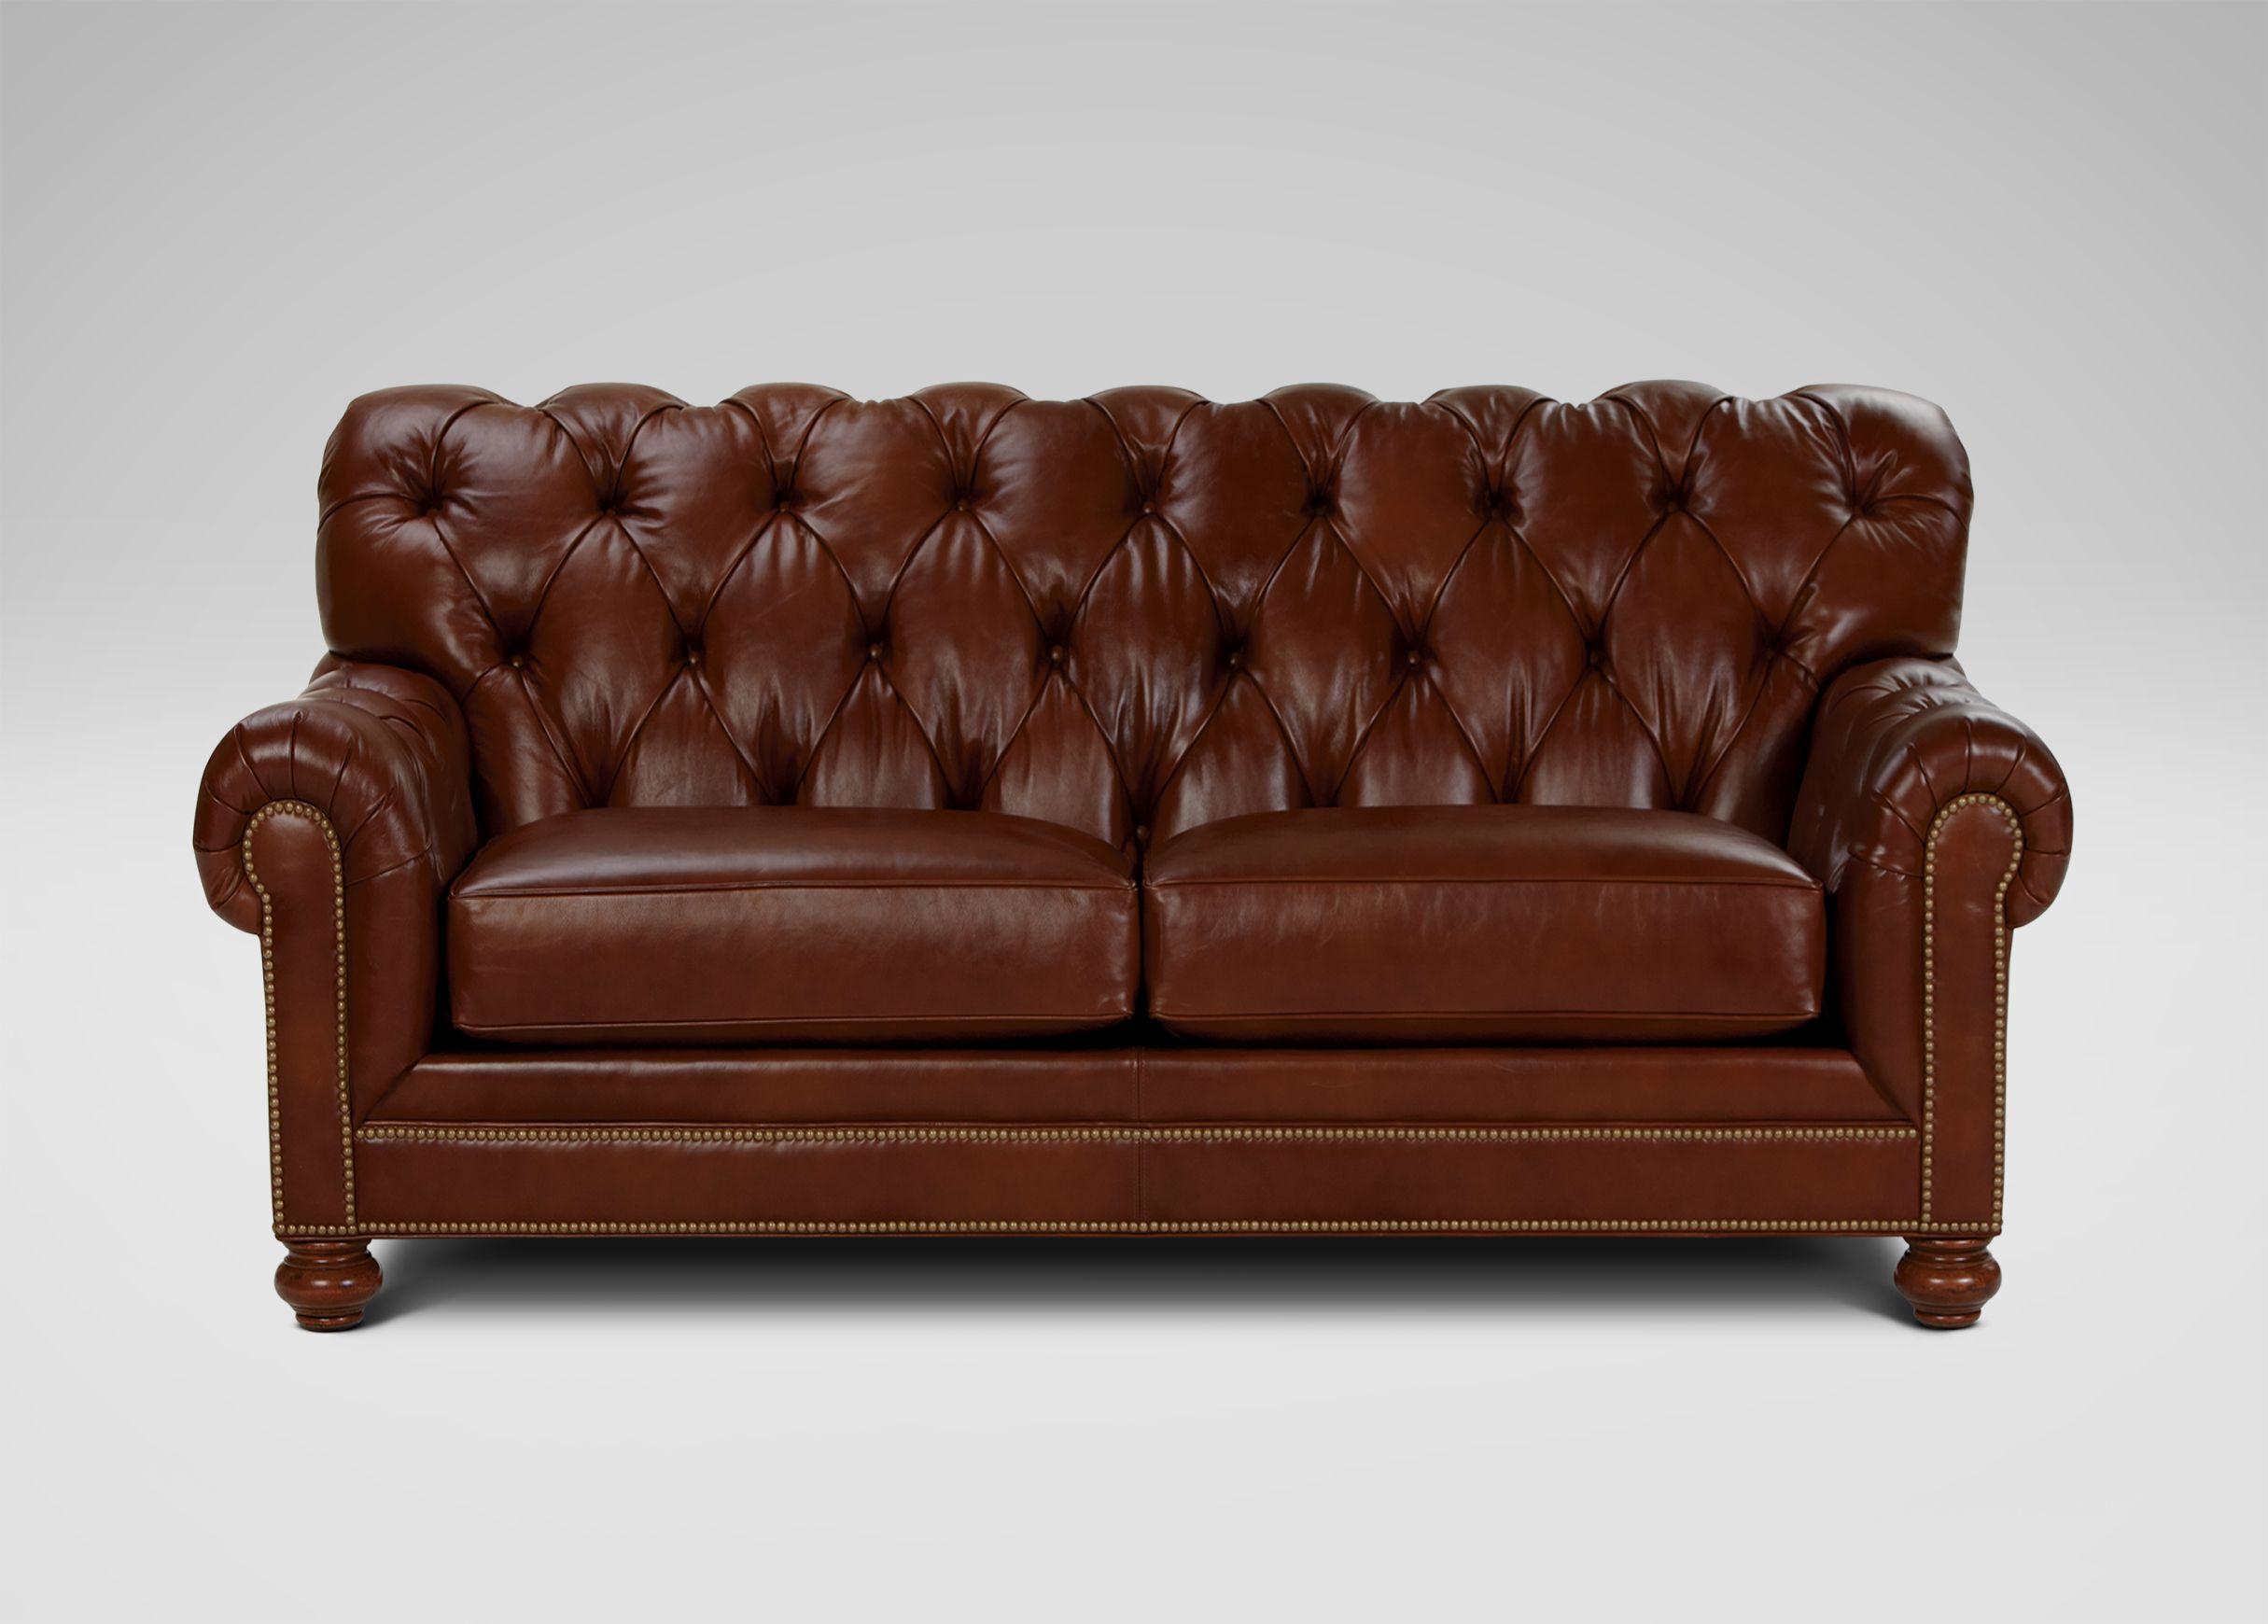 Chadwick Leather Sofa, Old English/Saddle Leather sofa